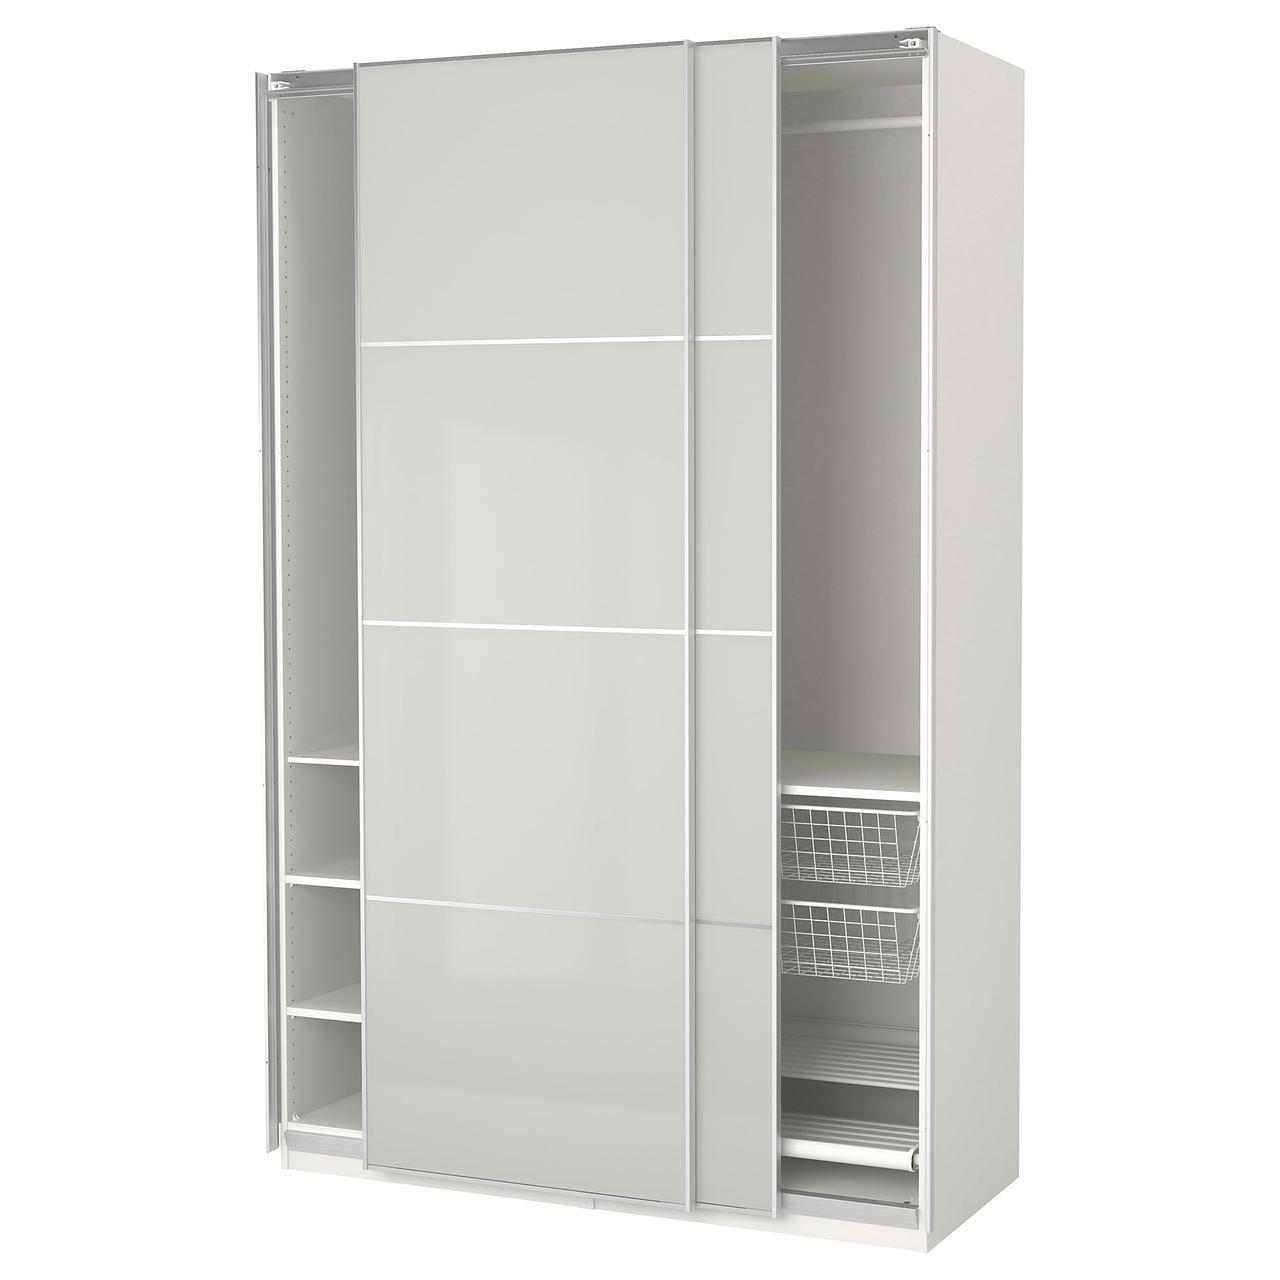 Шкаф-купе IKEA PAX 150x66x236 см Hokksund белый глянцевый светло-серый 092.211.39